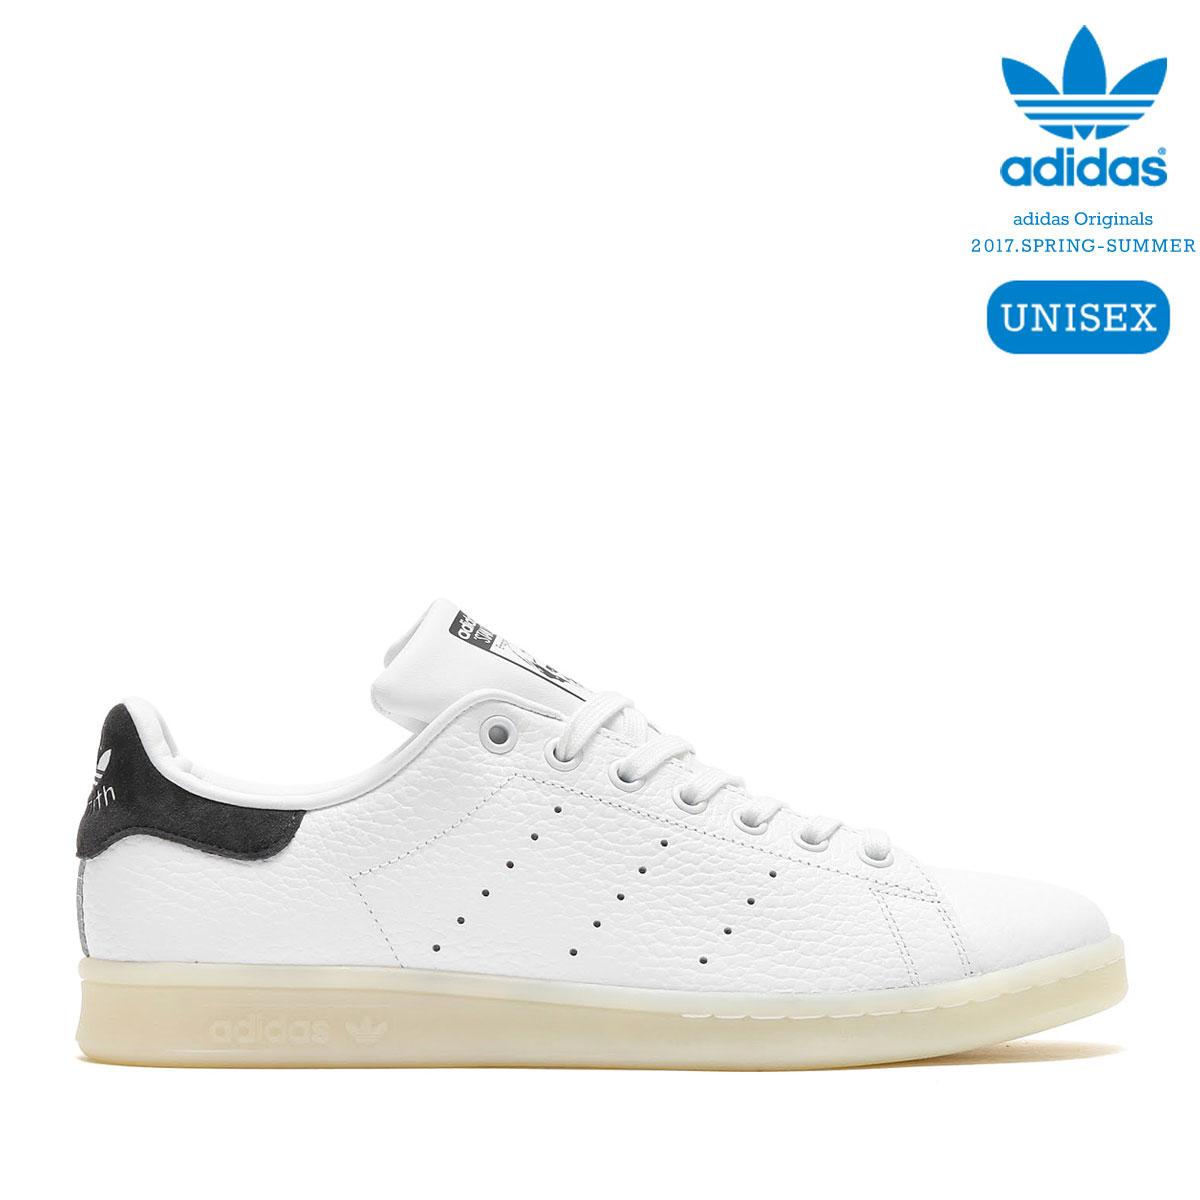 adidas Originals STAN SMITH (Running White/Running White/Utility Black) (アディダス オリジナルス スタンスミス) 【ユニセックスサイズ】【17SS-I】【30】【sale0123】